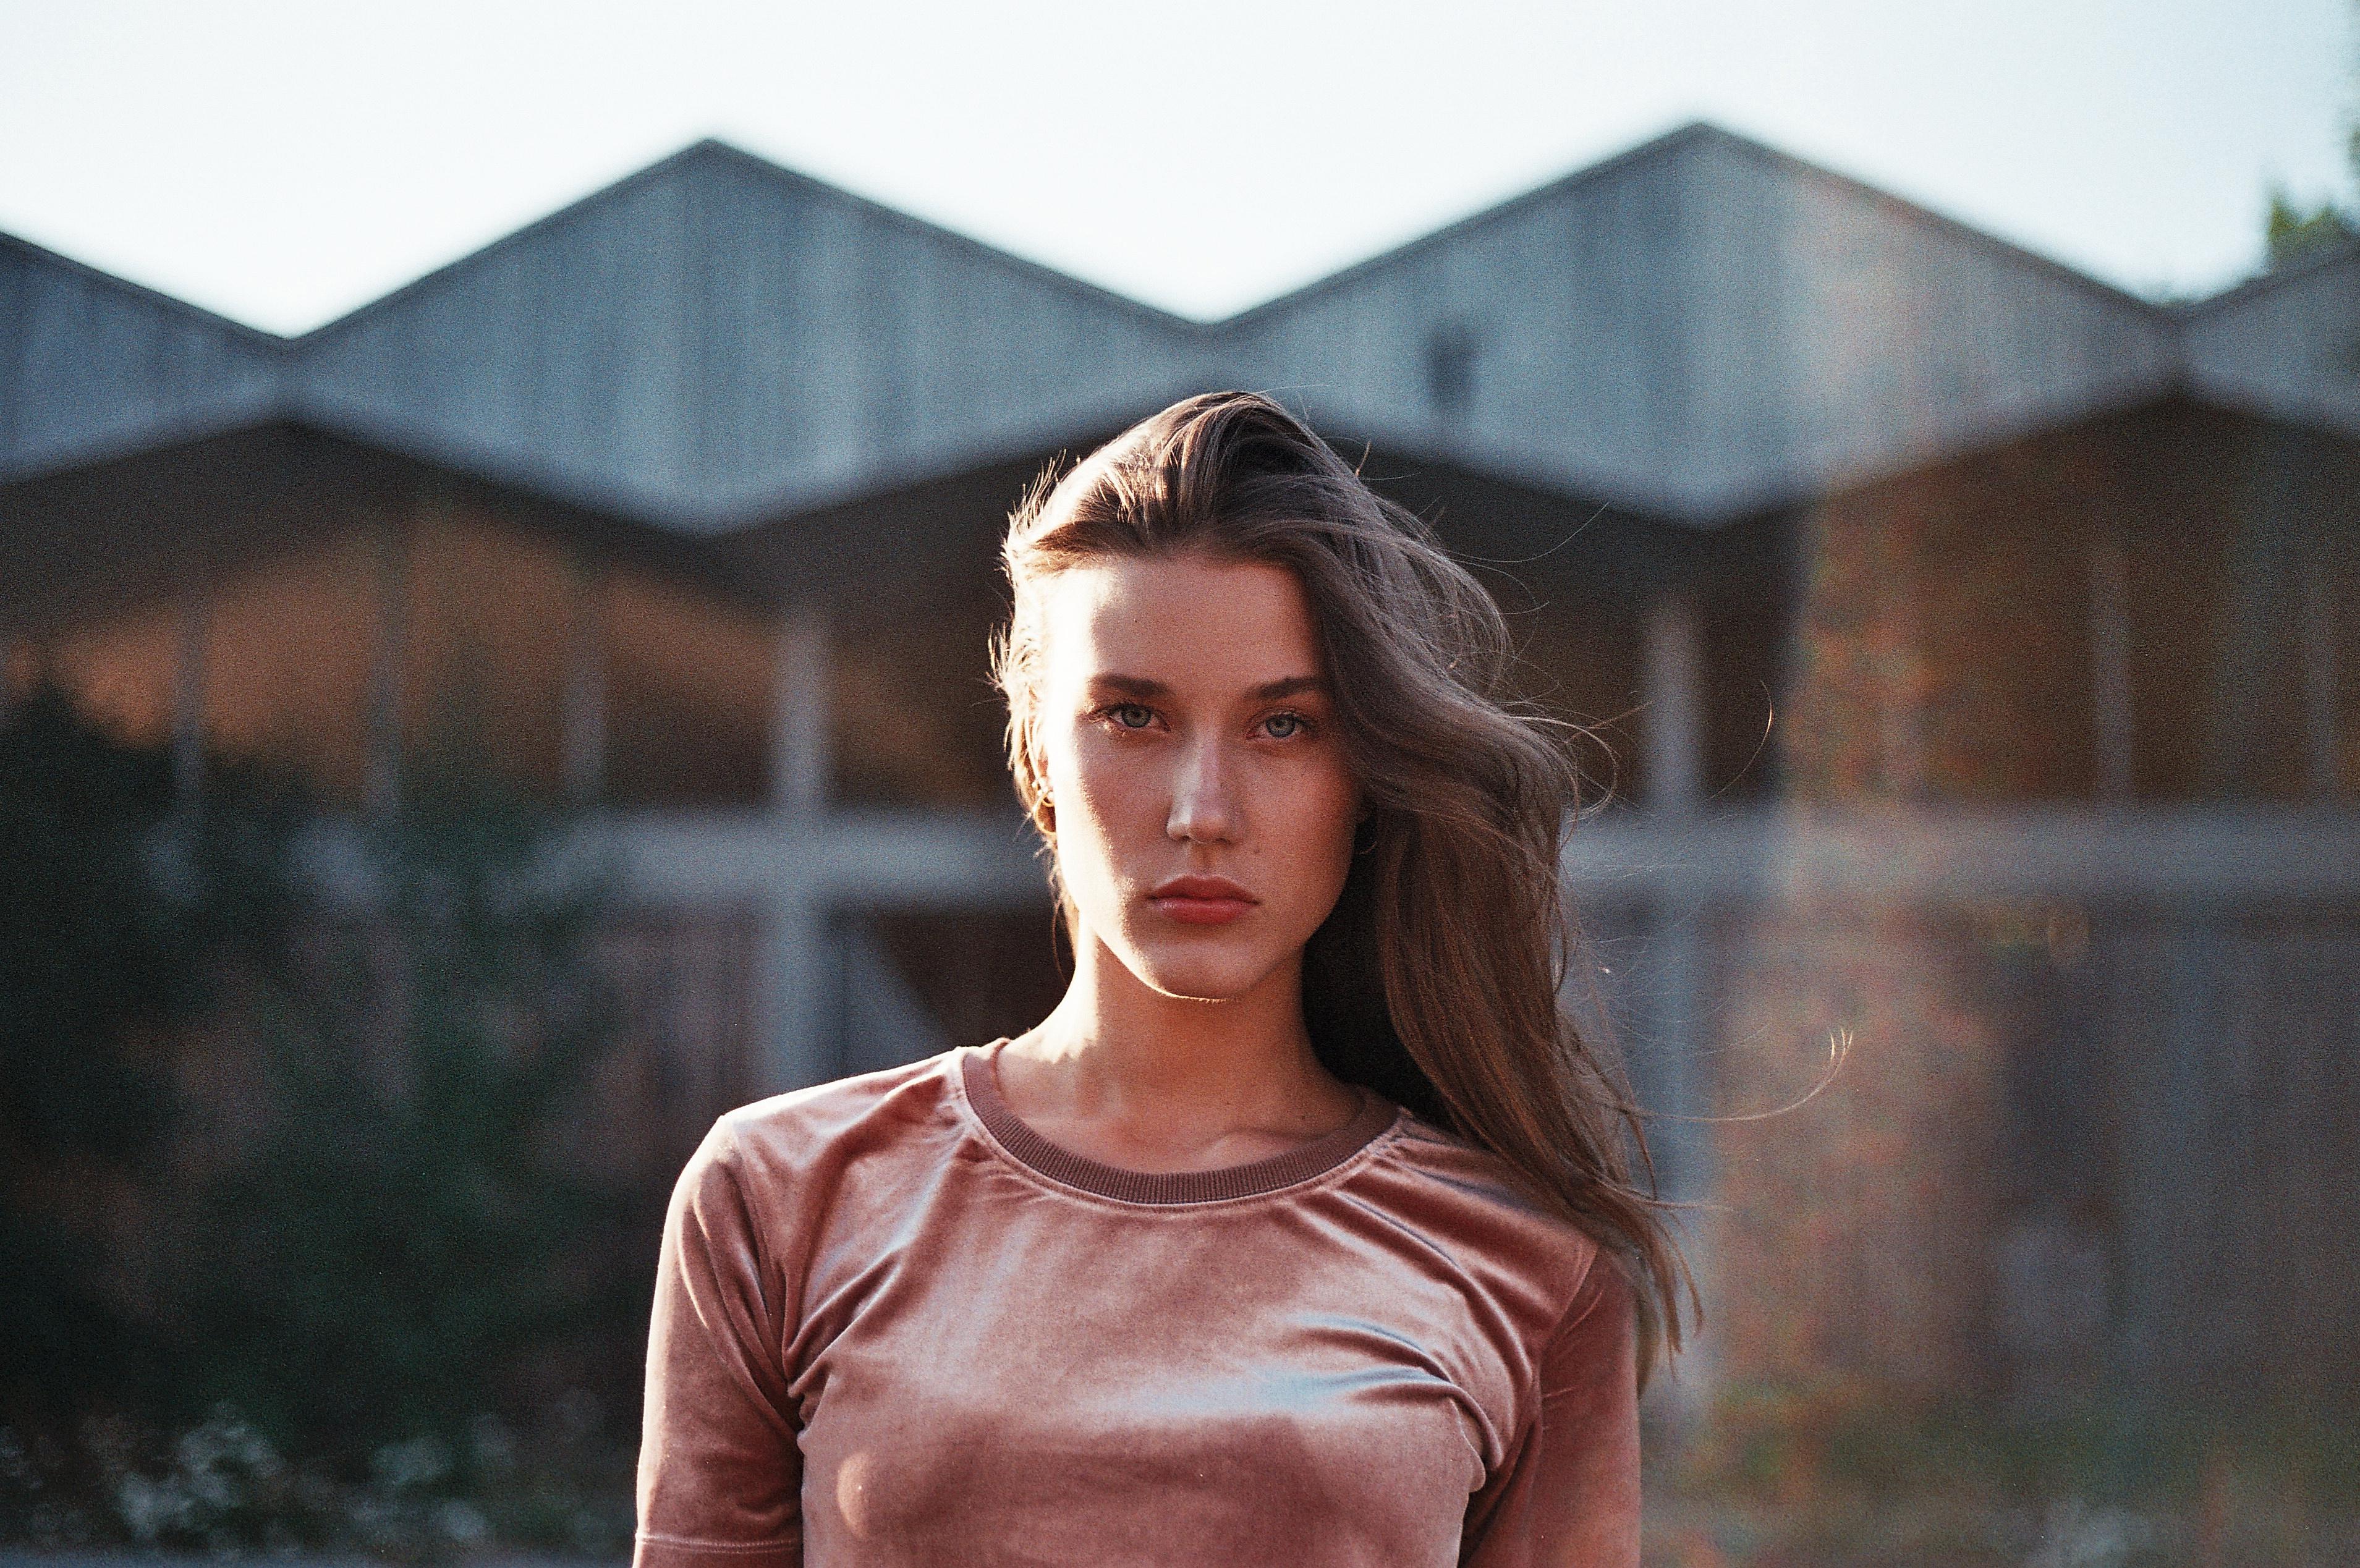 Kristelle_film_23